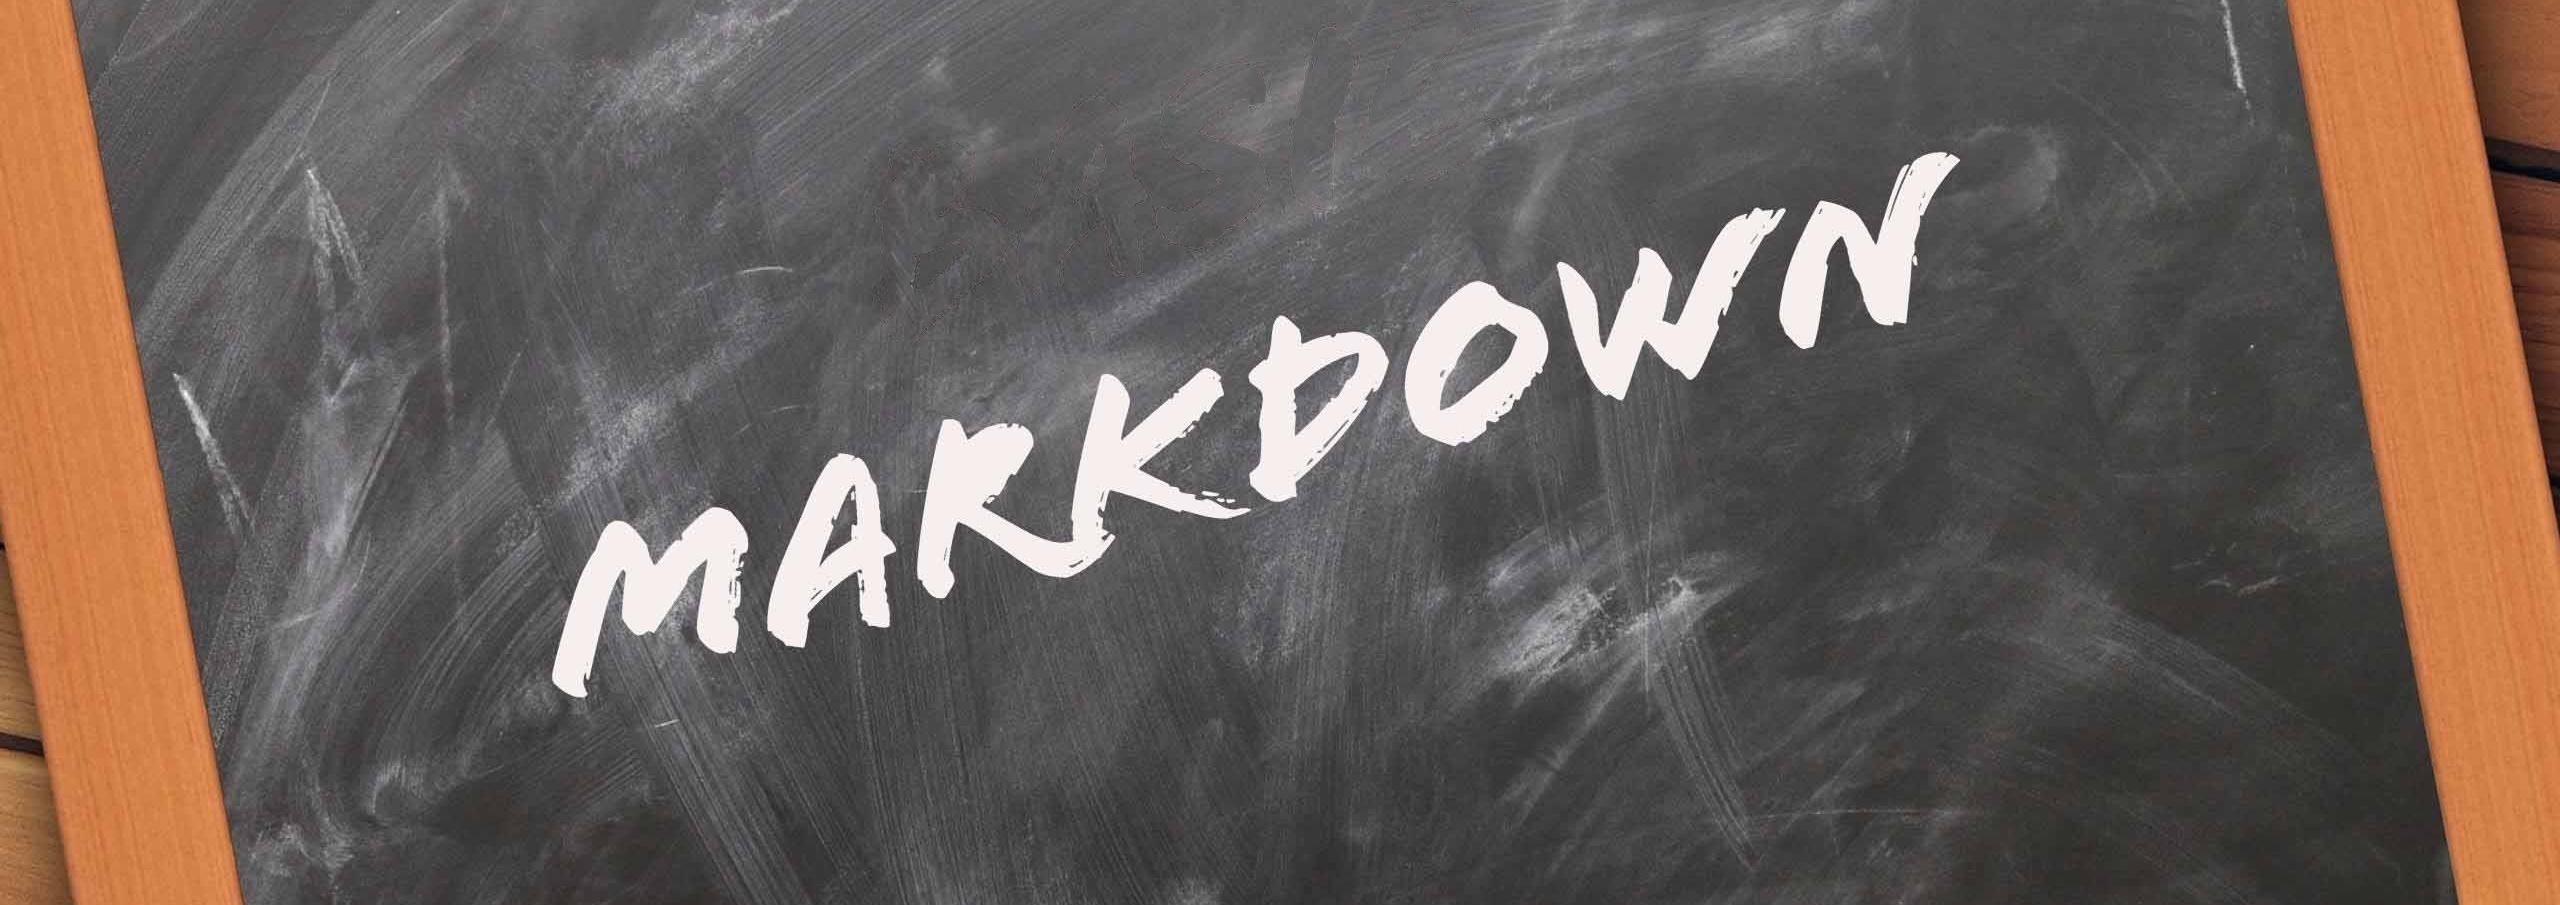 Copiez du contenu web au format markdown